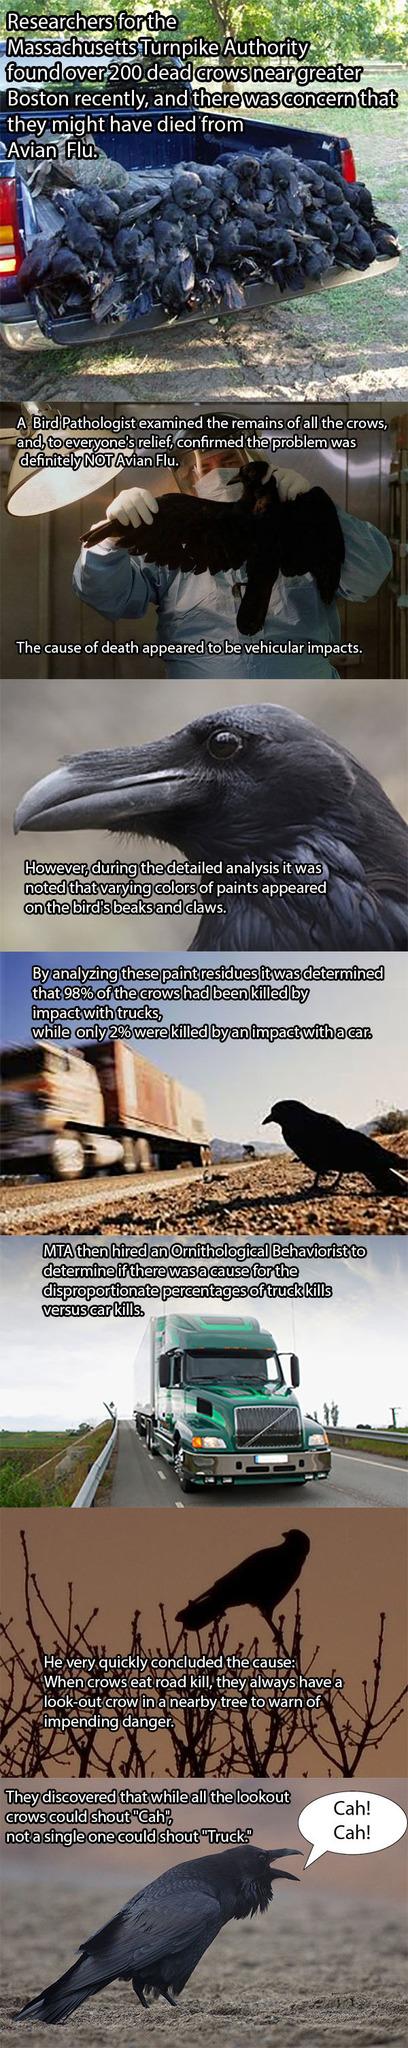 crow murder - meme